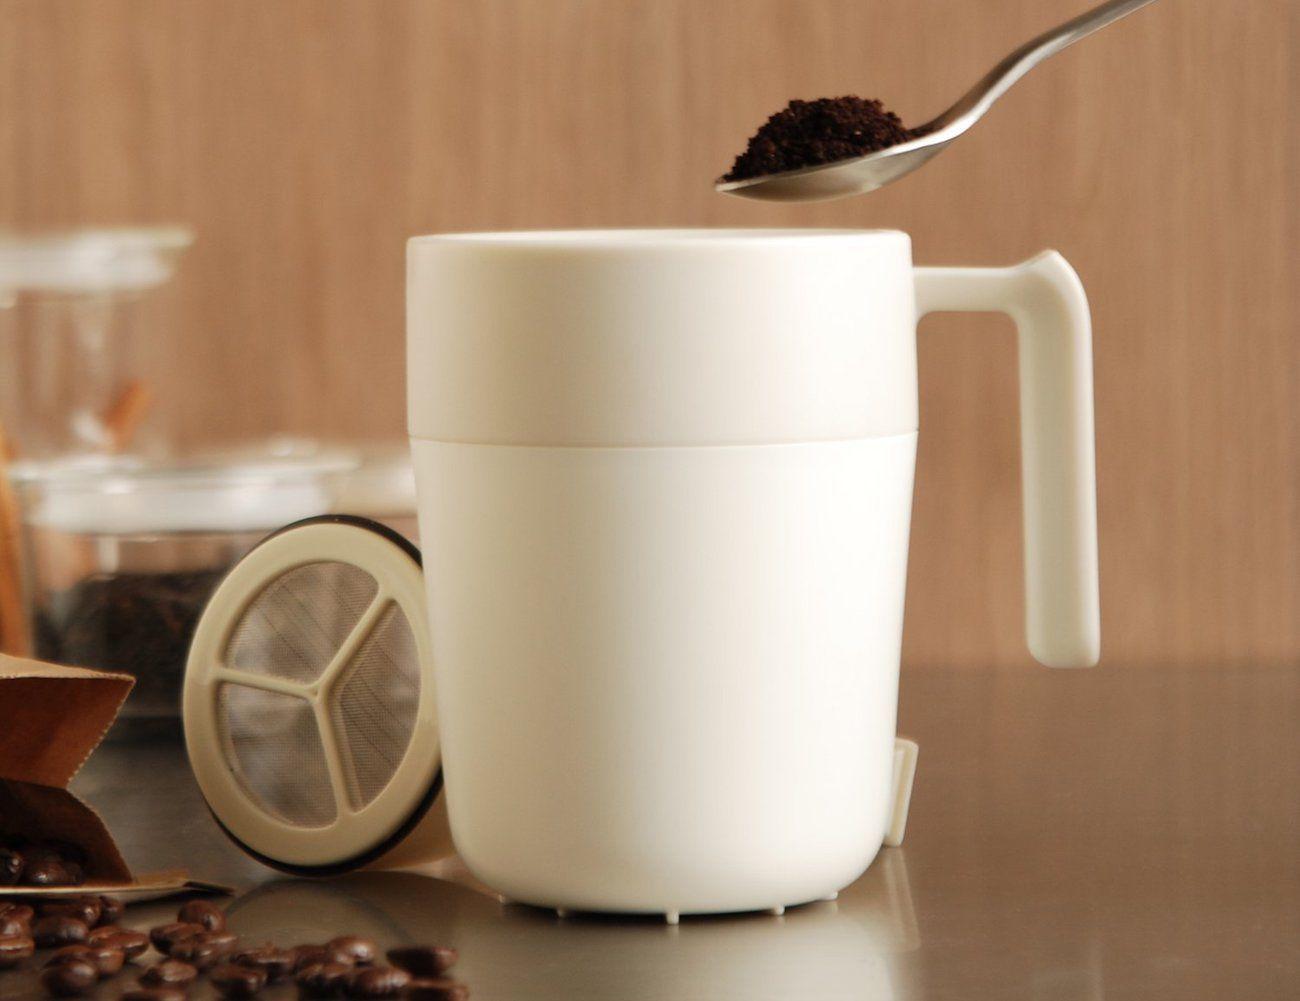 Kinto Cafe Press Instant Coffee Mug